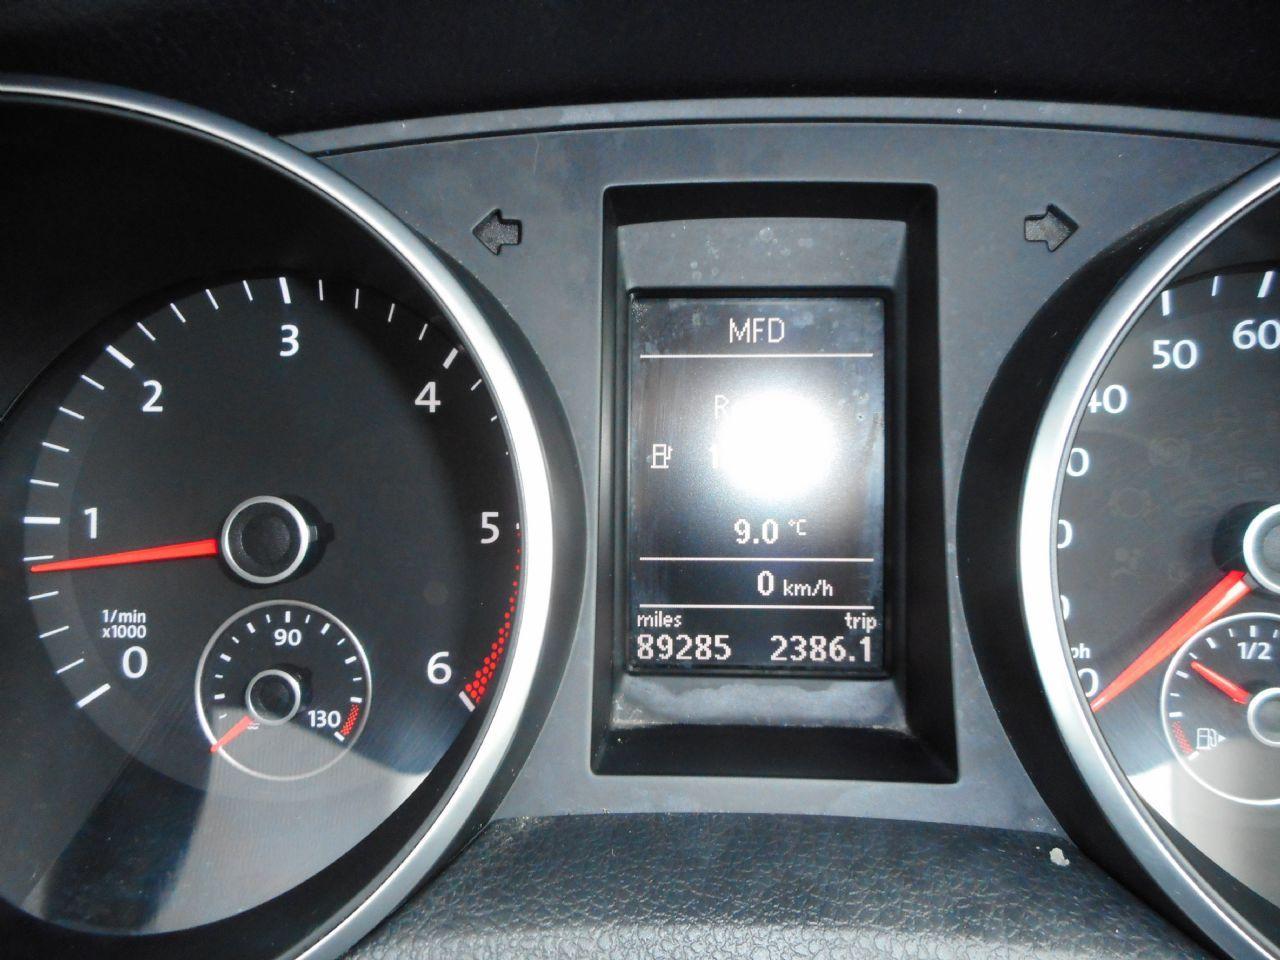 VOLKSWAGEN GOLF SE 1.6 TDI 105PS BlueMotion Tech (2011) - Picture 12